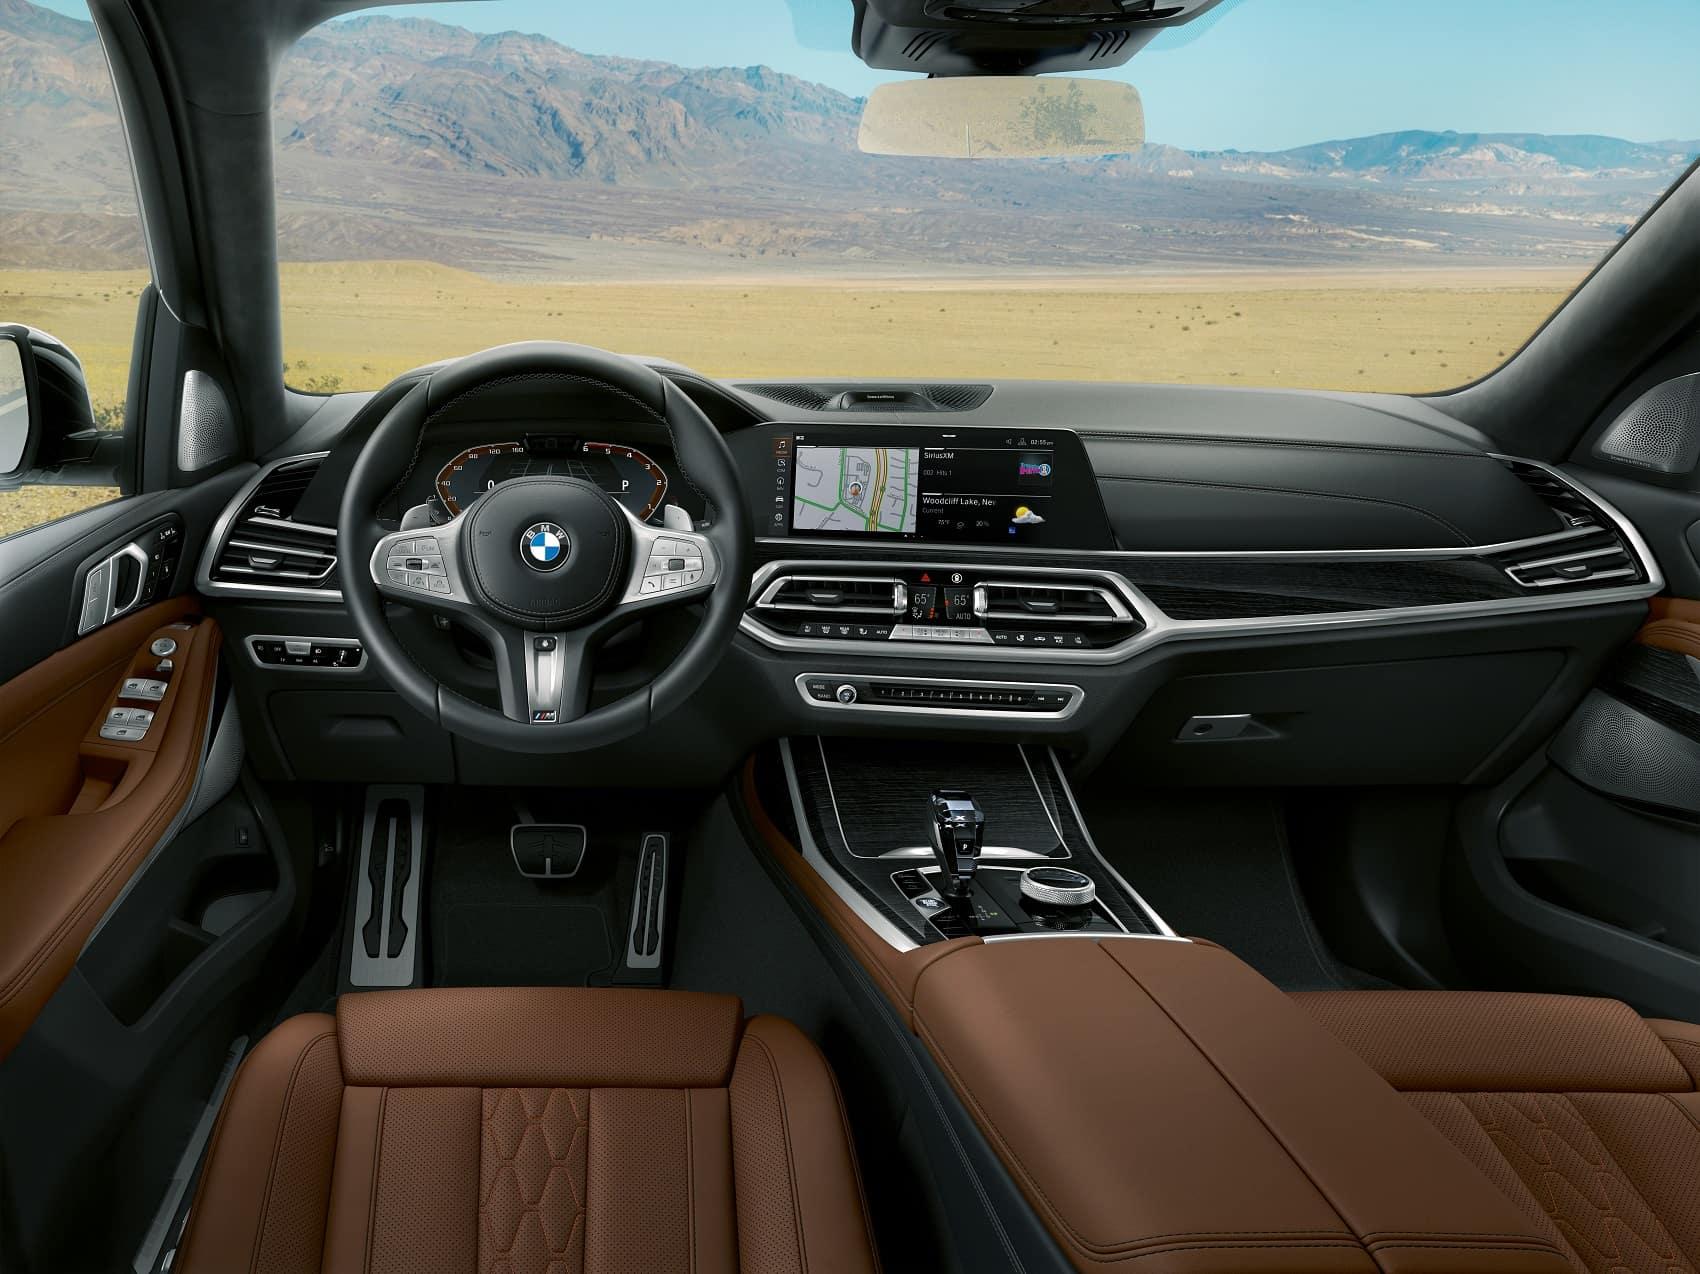 2019 BMW X7 Interior Leather Seats